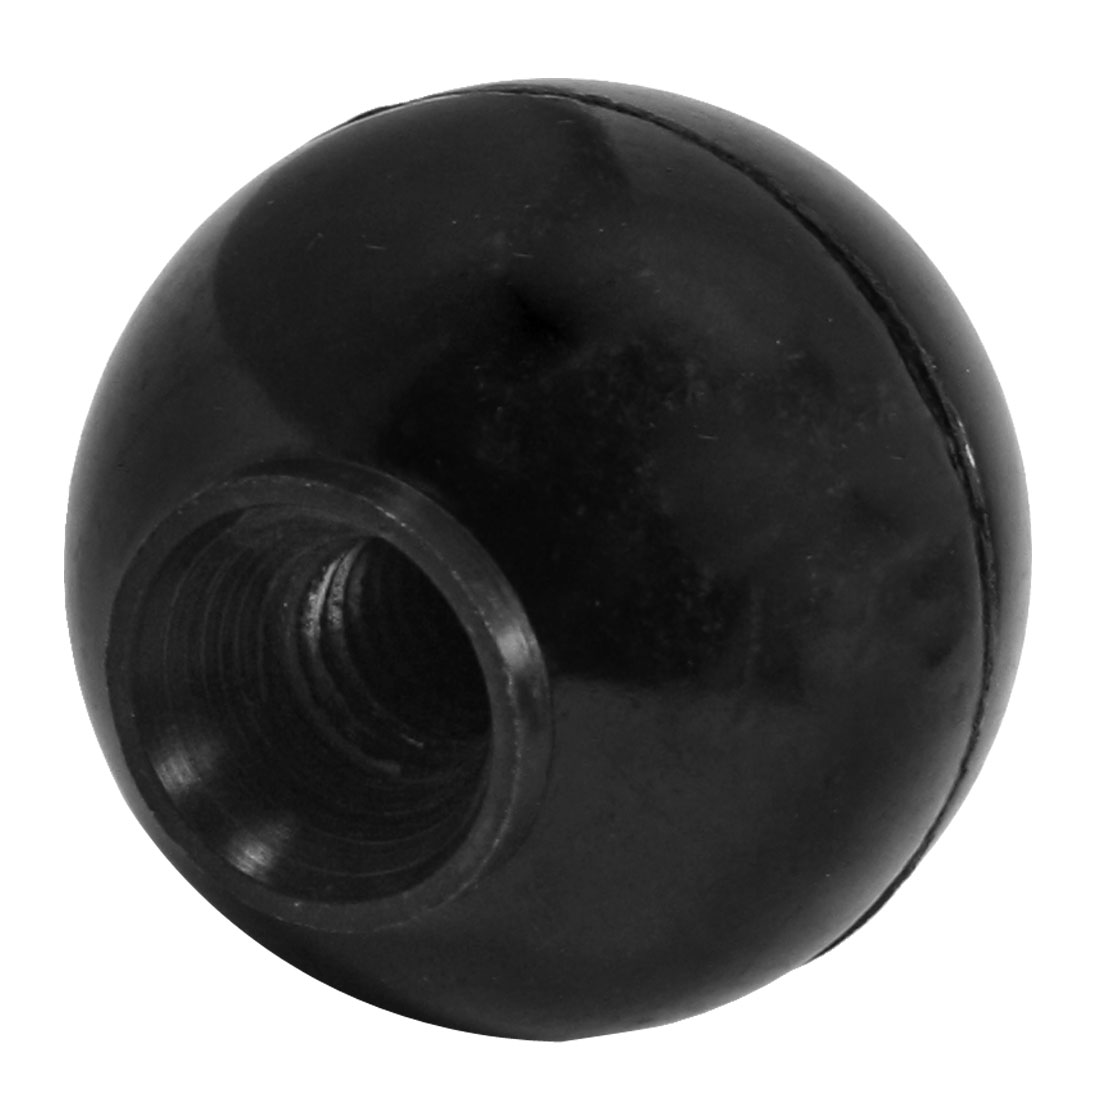 Threaded Knob Plastic Machine Operation Handle Ball 45mm Dia 10mm Bore